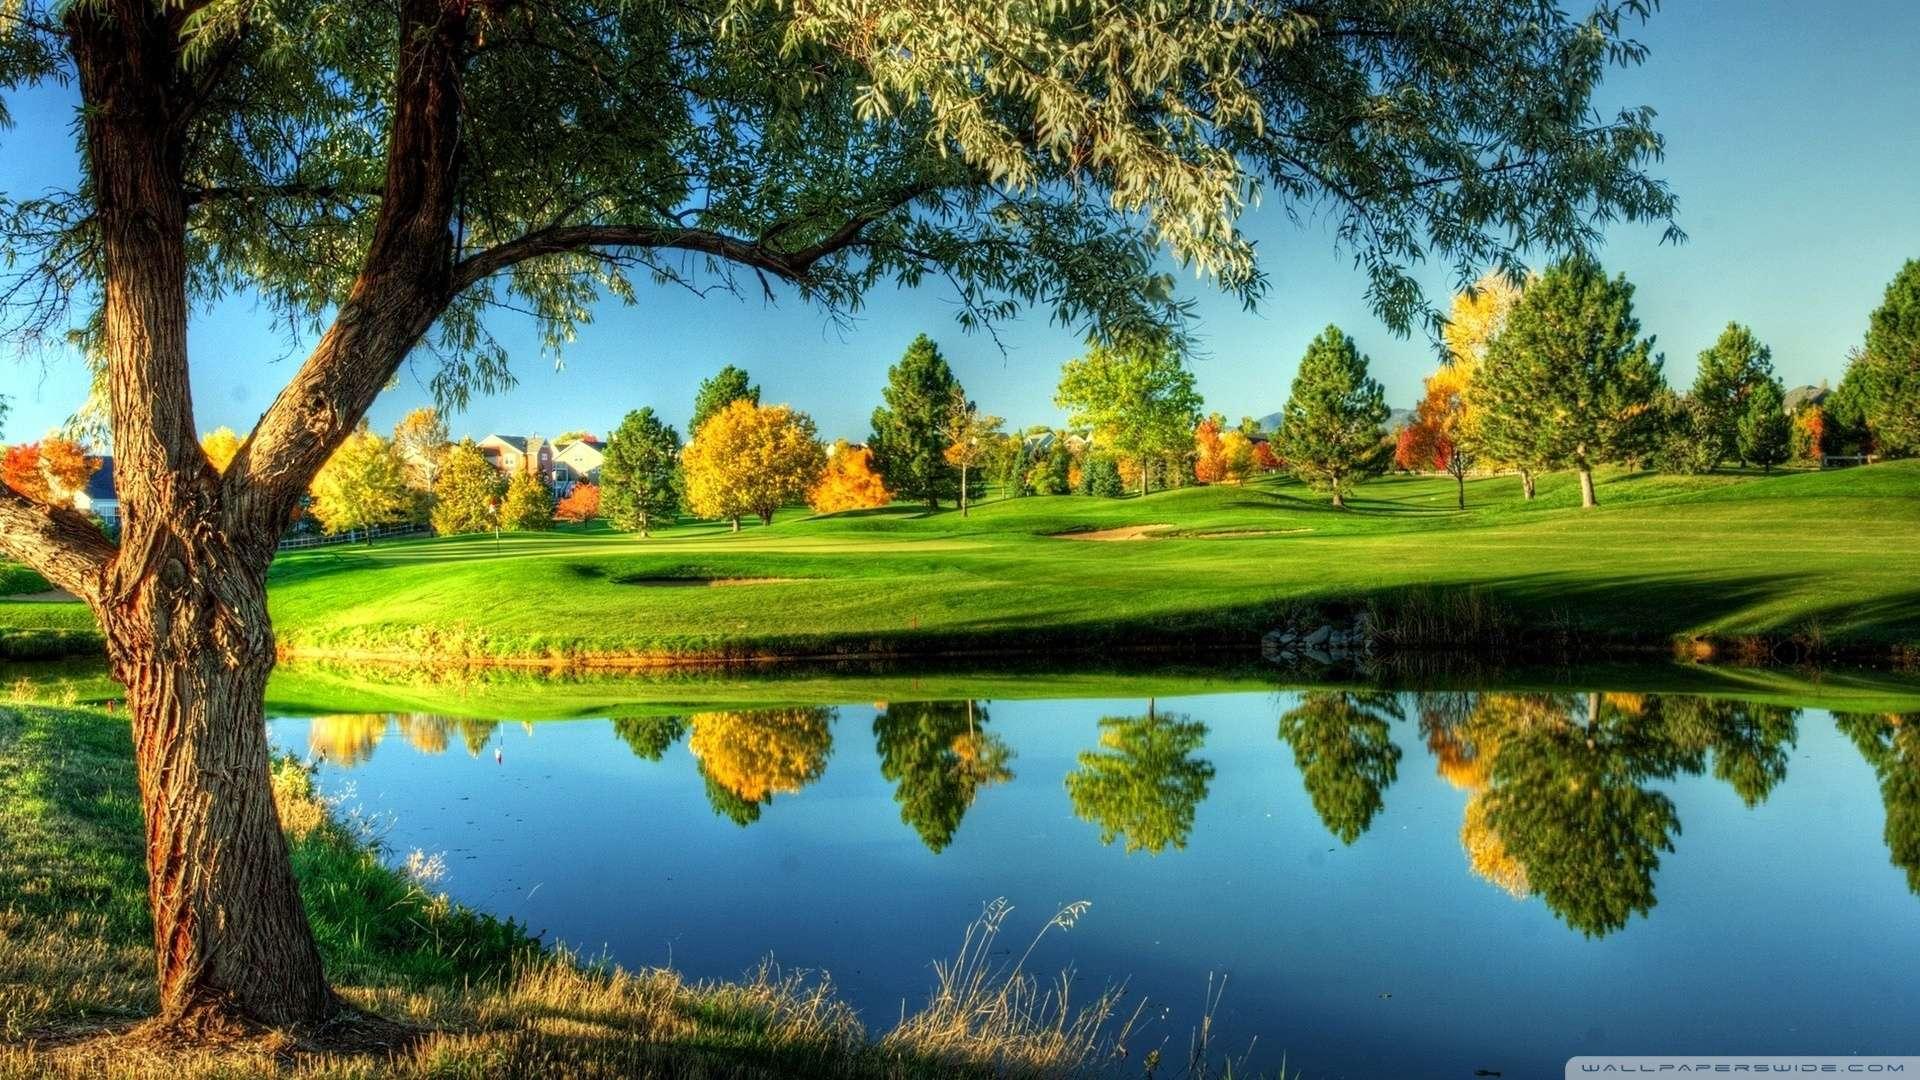 Hd wallpaper landscape - Wallpaper Golf Course Landscape Wallpaper 1080p Hd Upload At